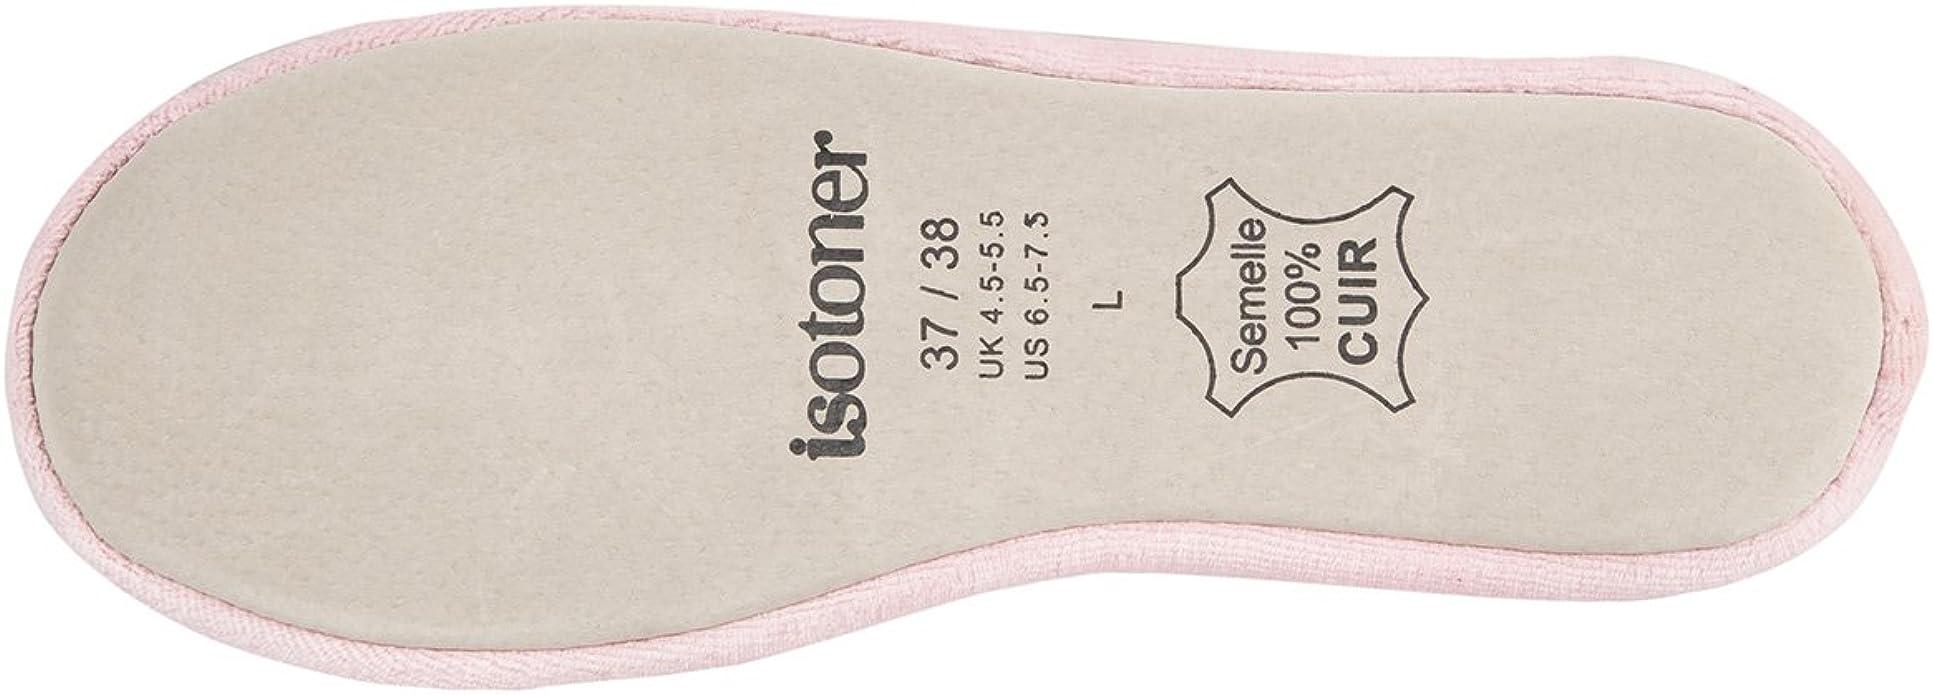 Rose Isotoner 41//42 EU Chausson ballerine Isotoner ref/_iso34217-multicolore